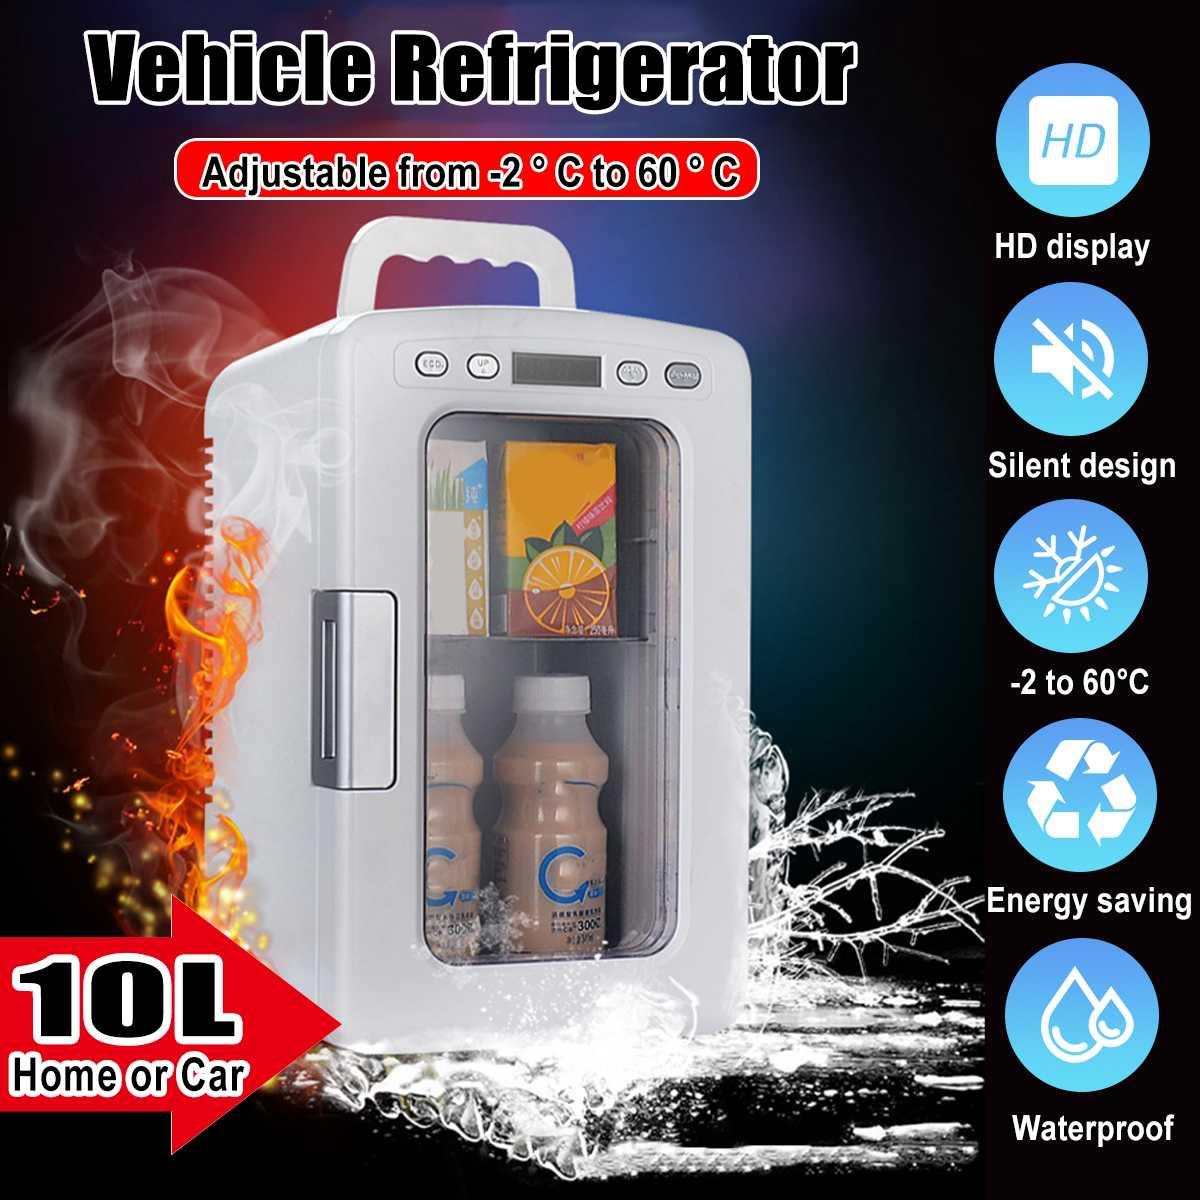 10L 12v 220v Mini Car Home Refrigerator Warmer  Freezer Cooler Portable Fridge Compressor Auto Refrigerator Temper Adjustable